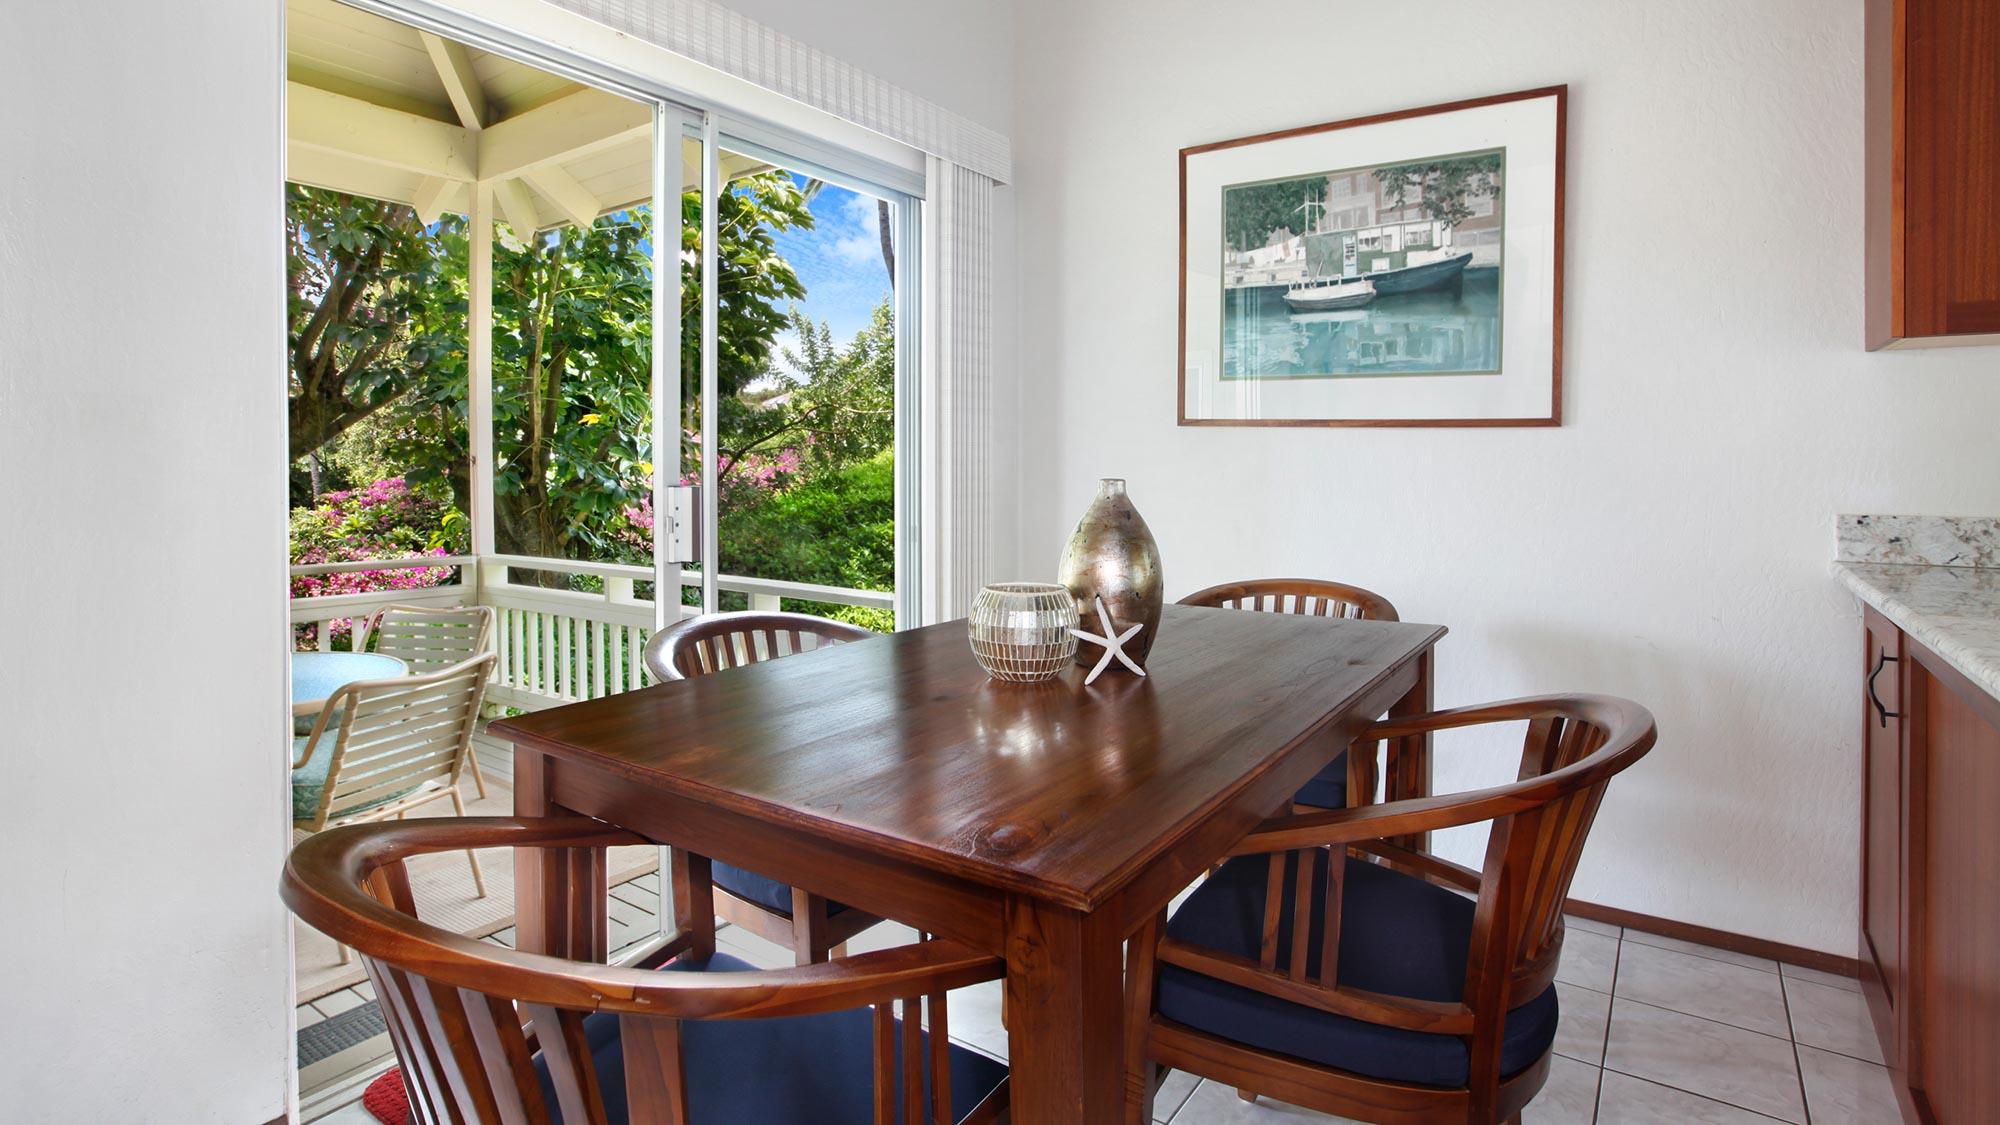 Maison Du Convertible Avis poipu crater resort #23 - kauai vacation rentals